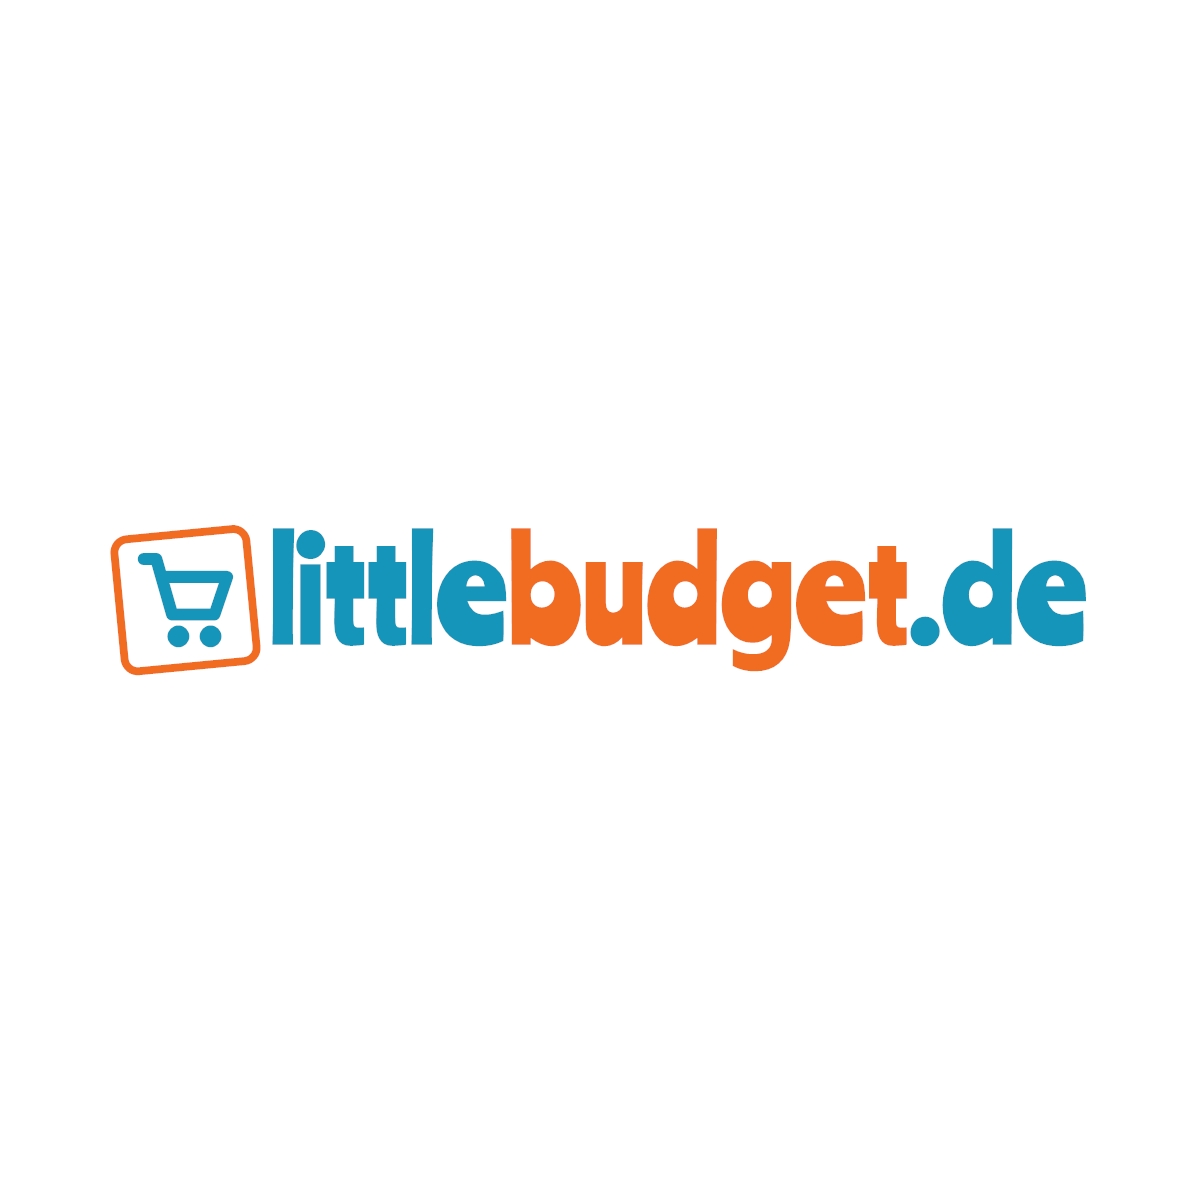 LittleBudget.de neuer Online Shop will Platzhirsch werden